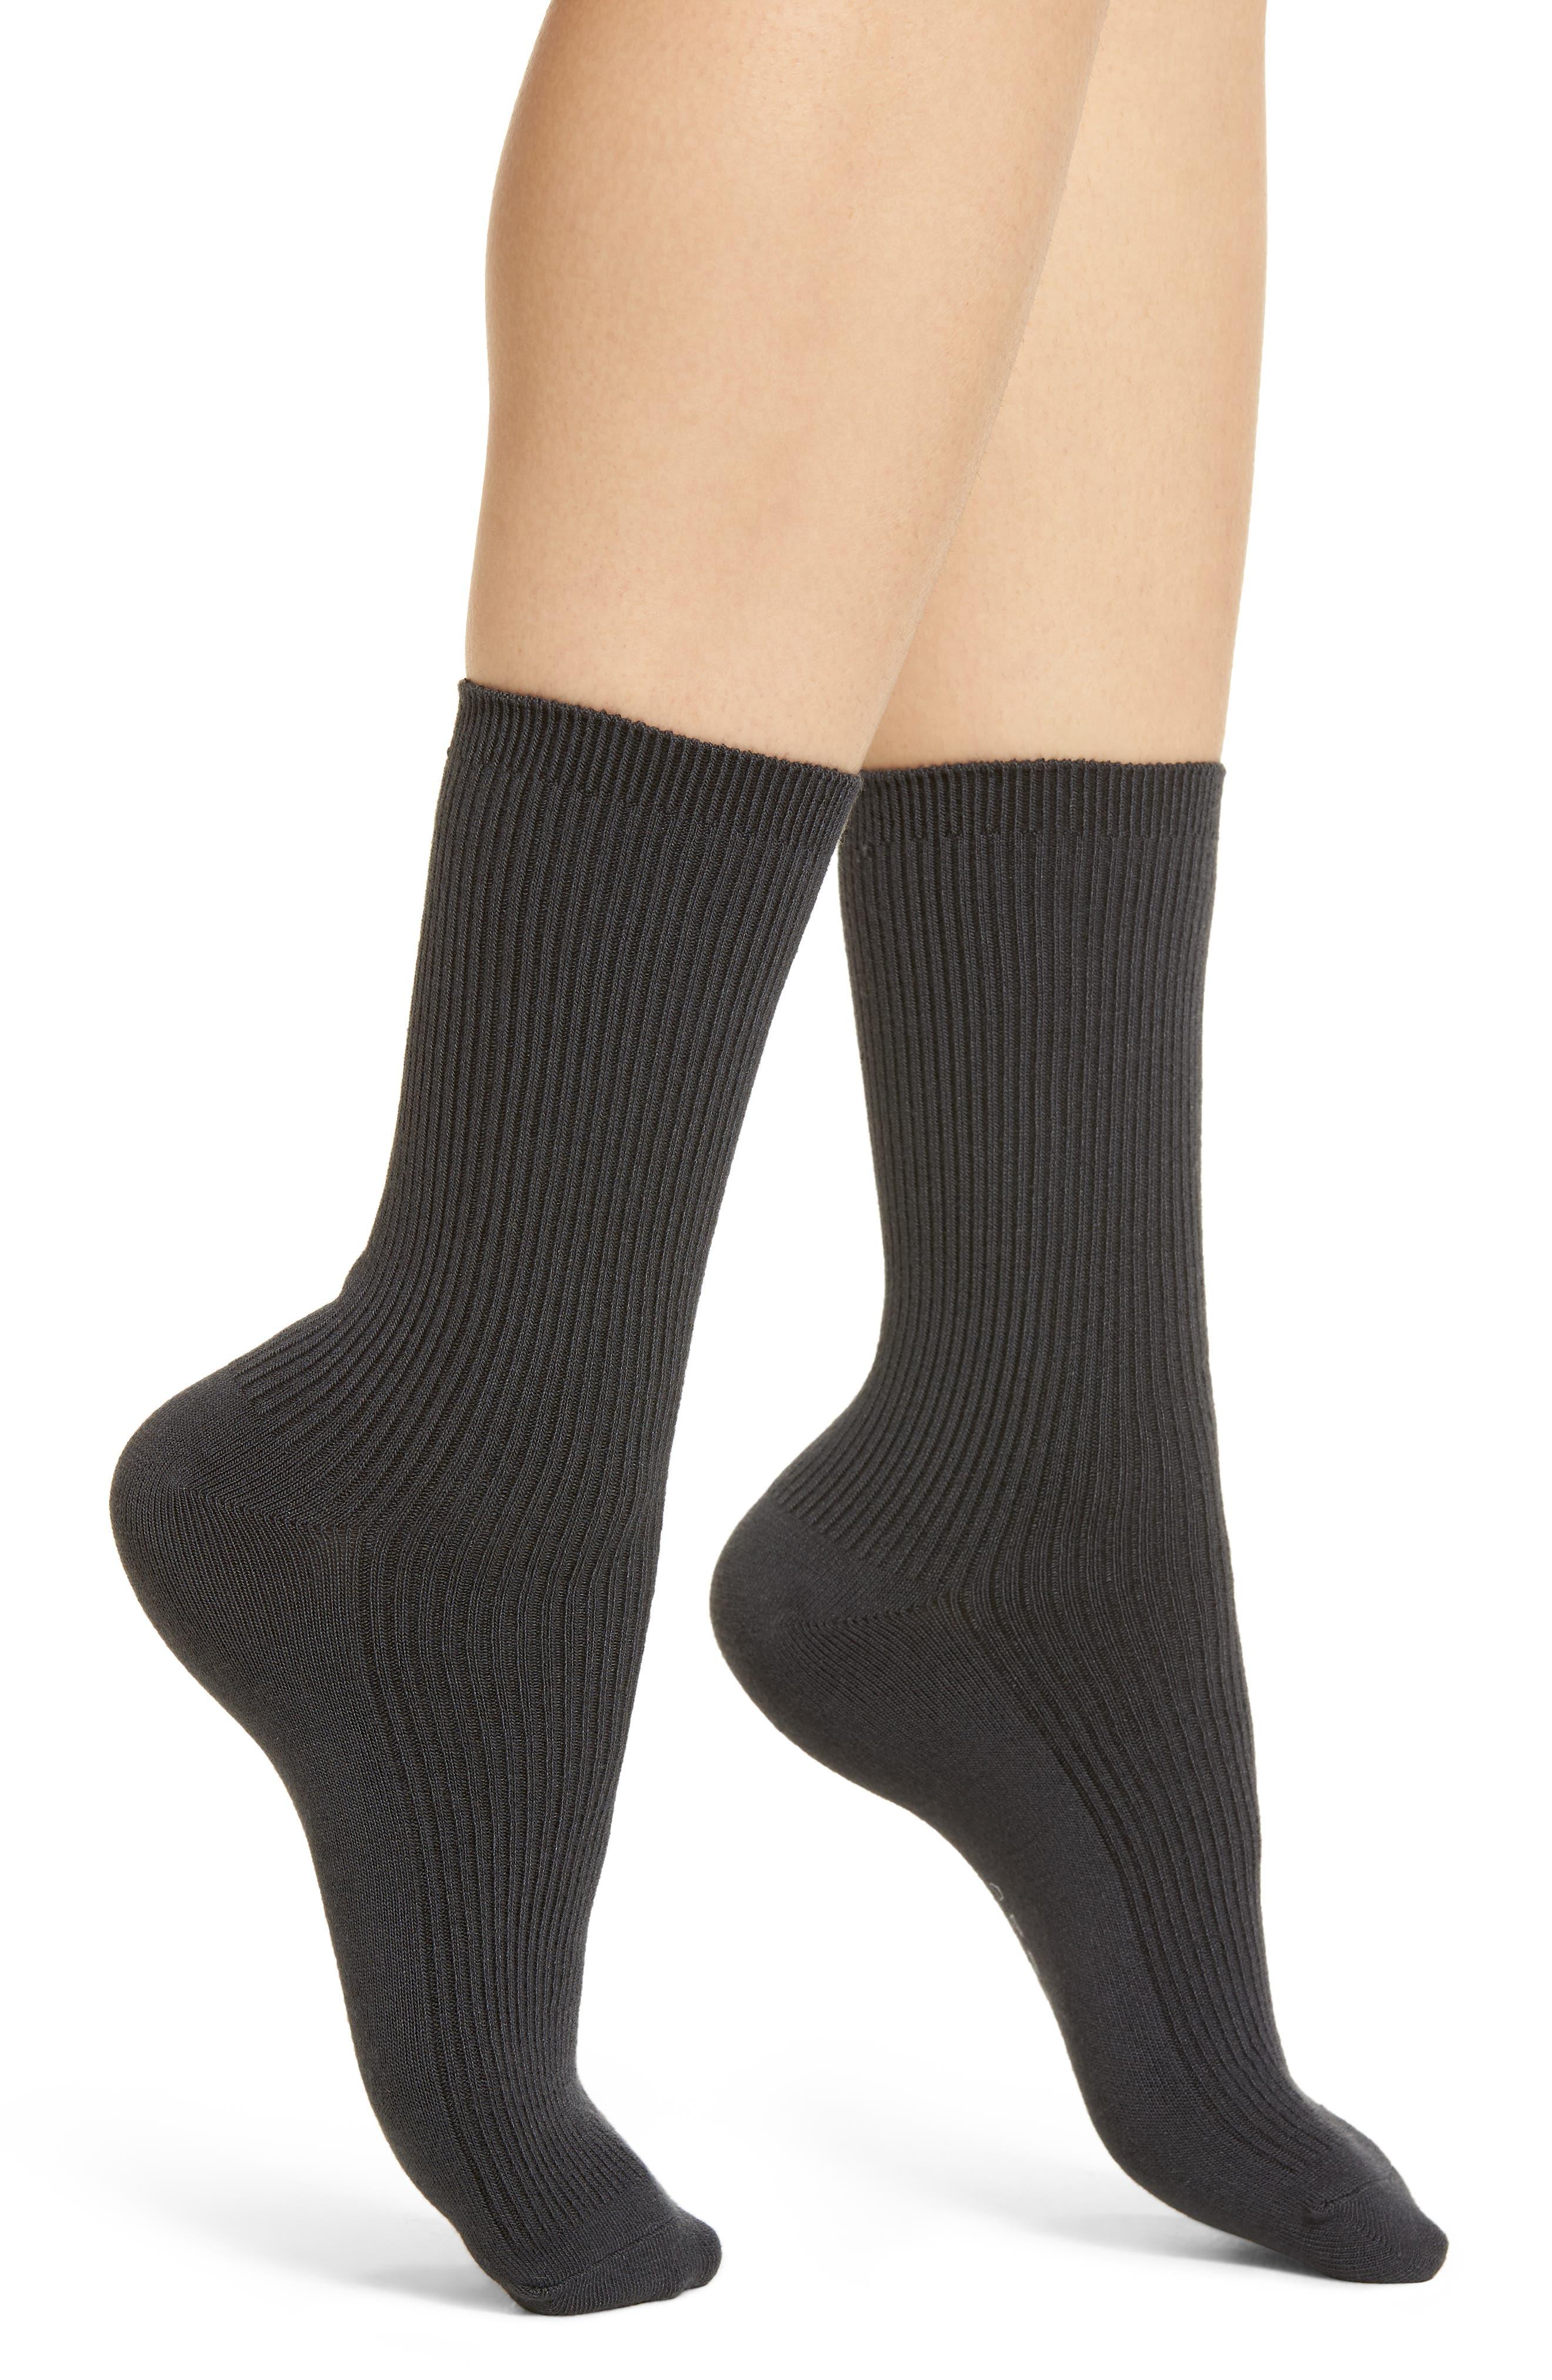 Nightingale Crew Socks,                         Main,                         color, 010